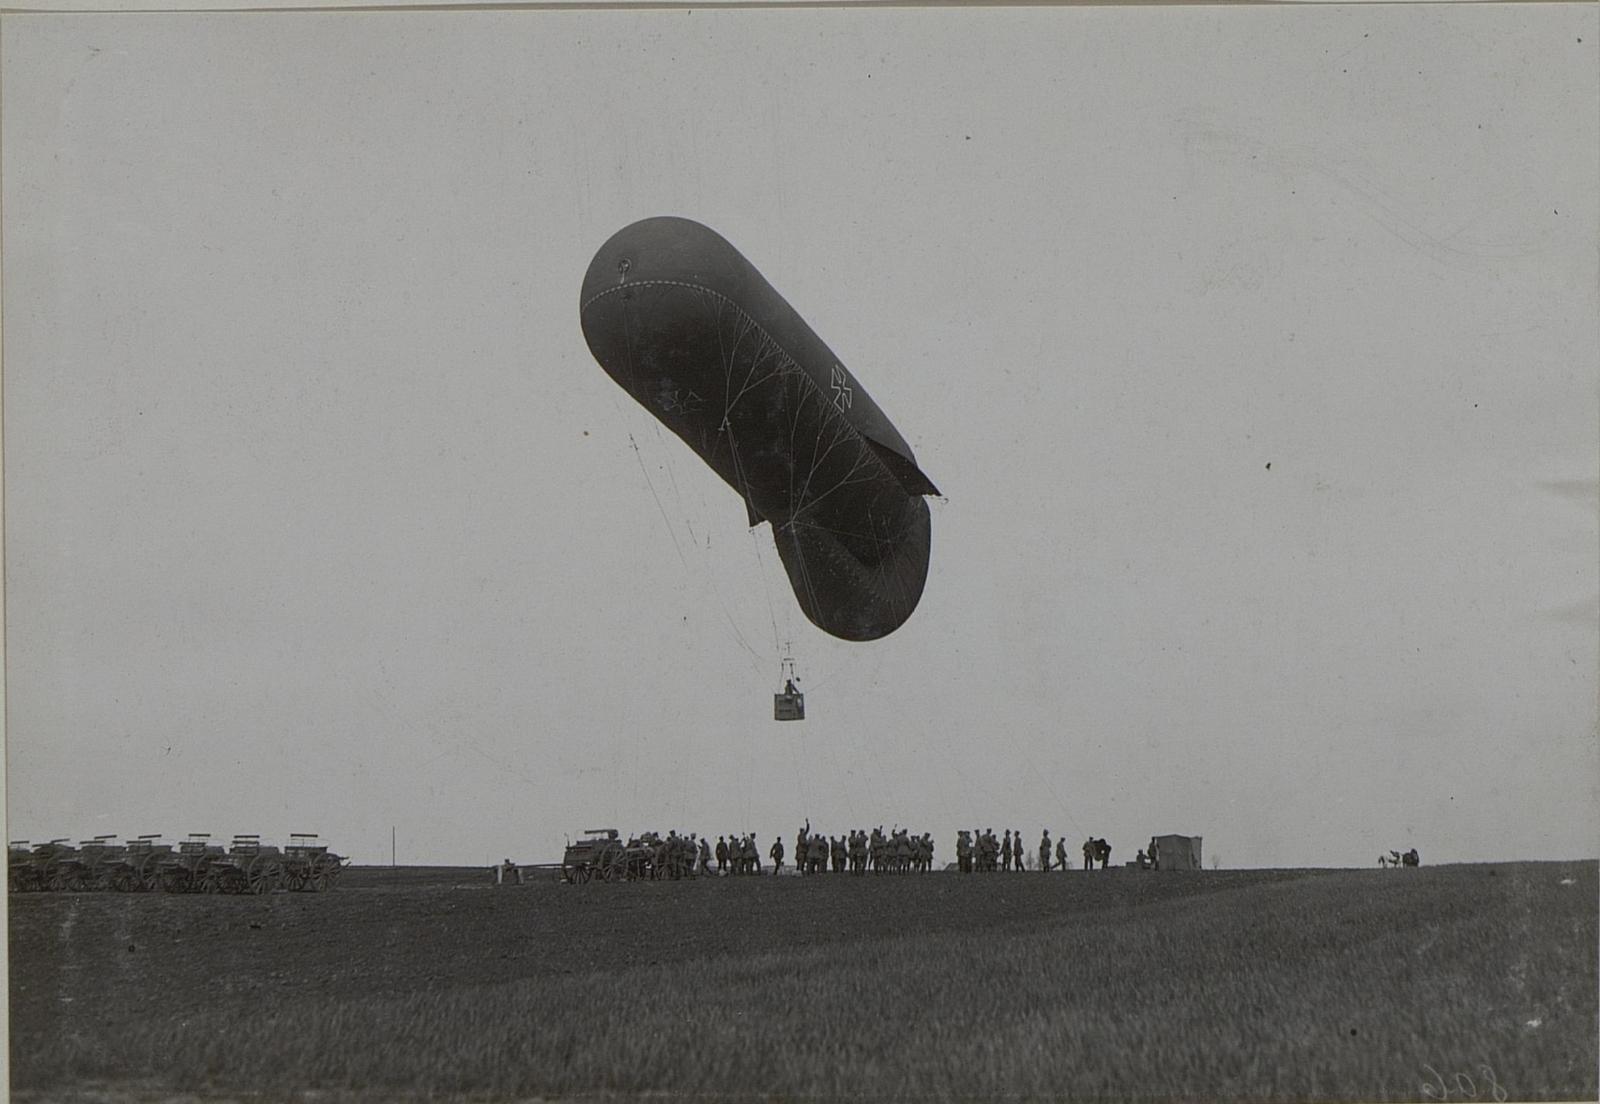 Fesselballon beim Aufstieg